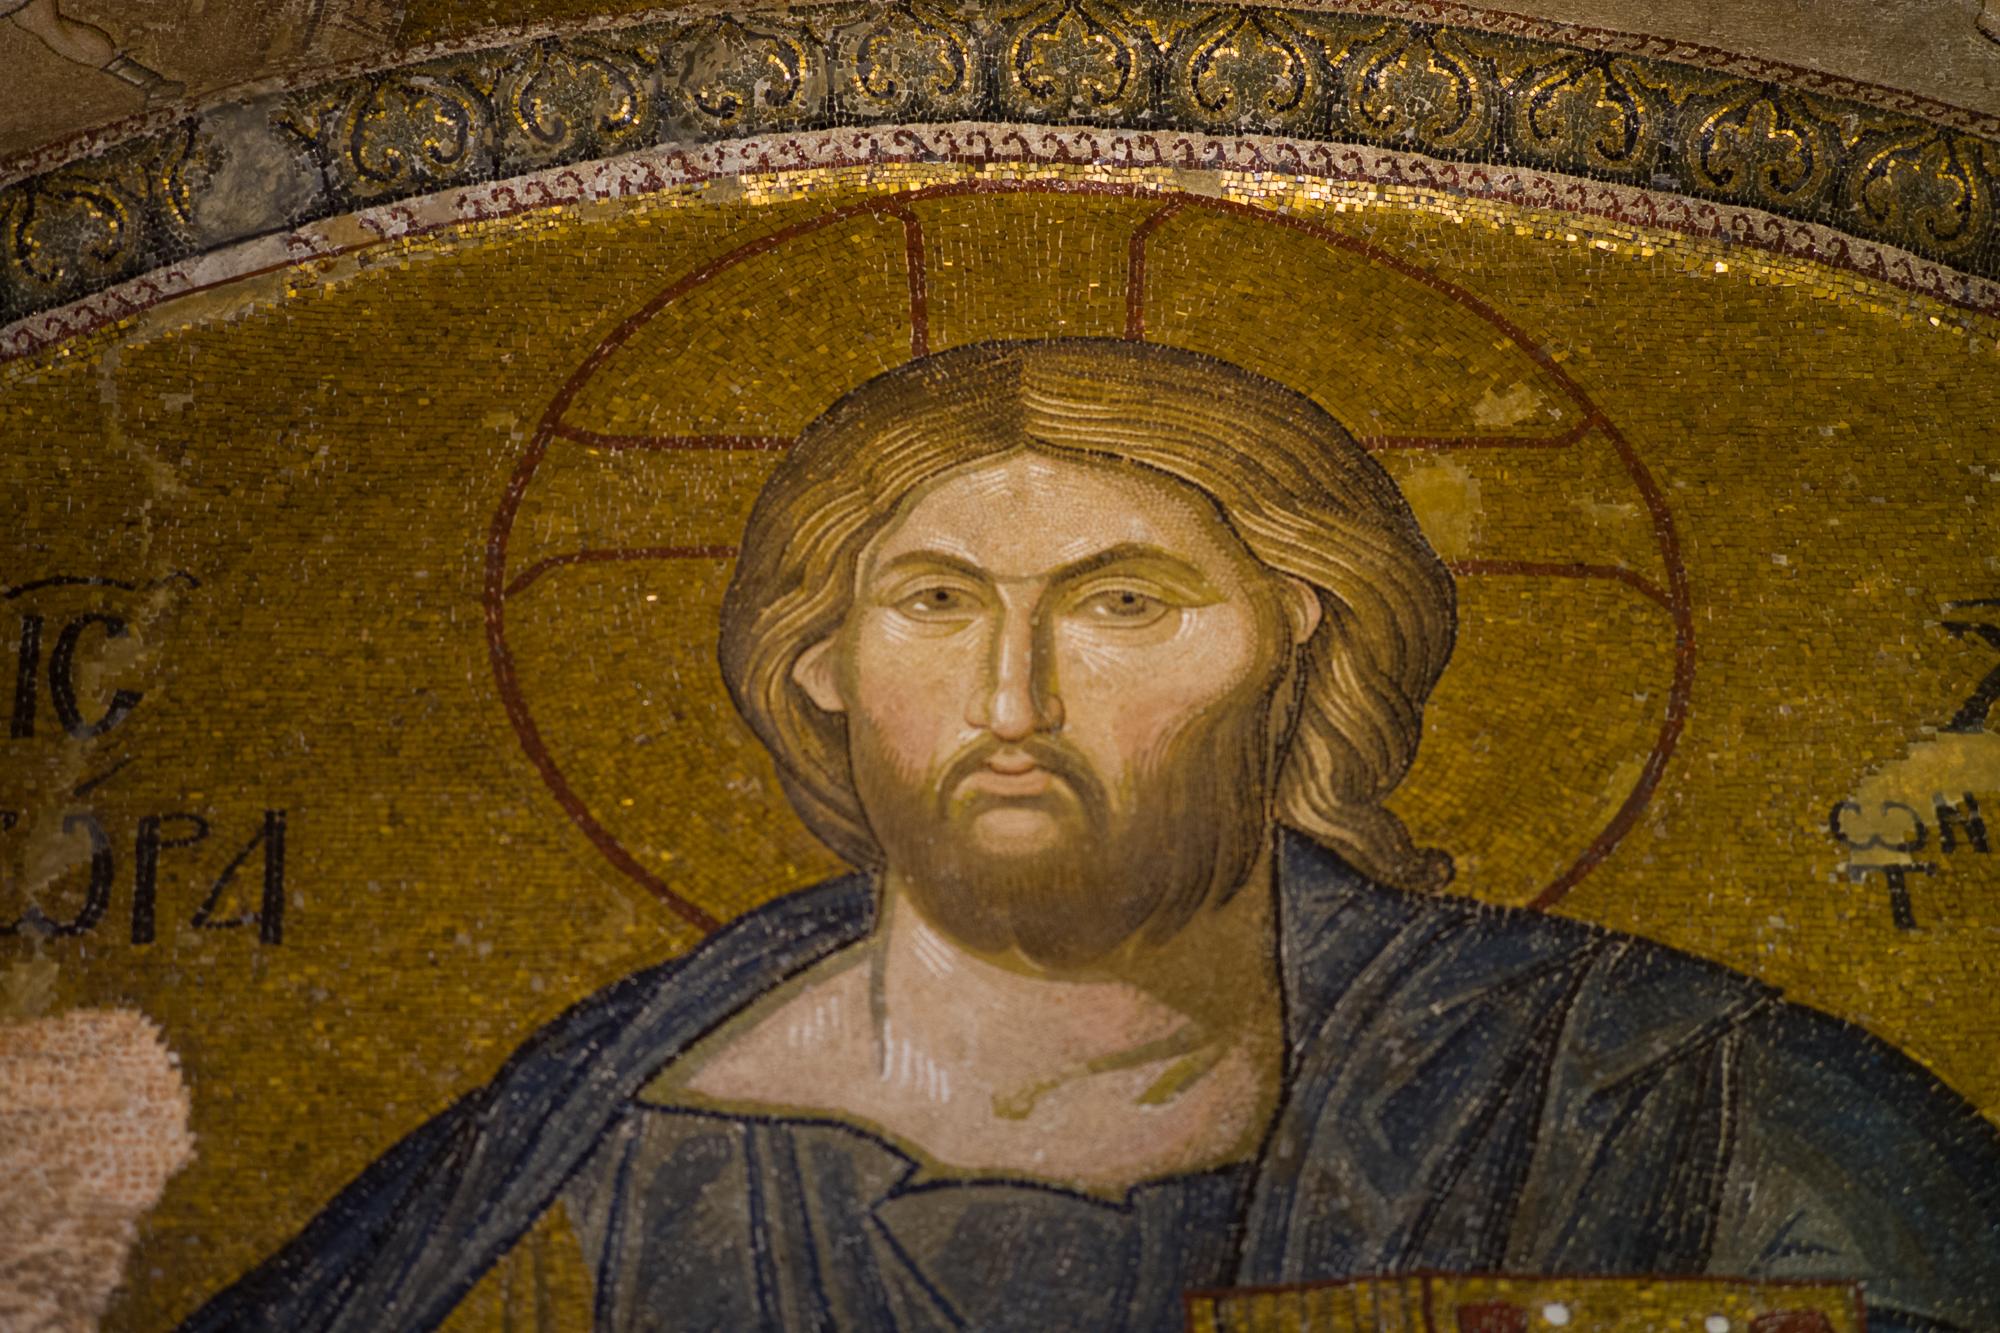 Mosaic of Jesus in the Chora Greek Orthodox church